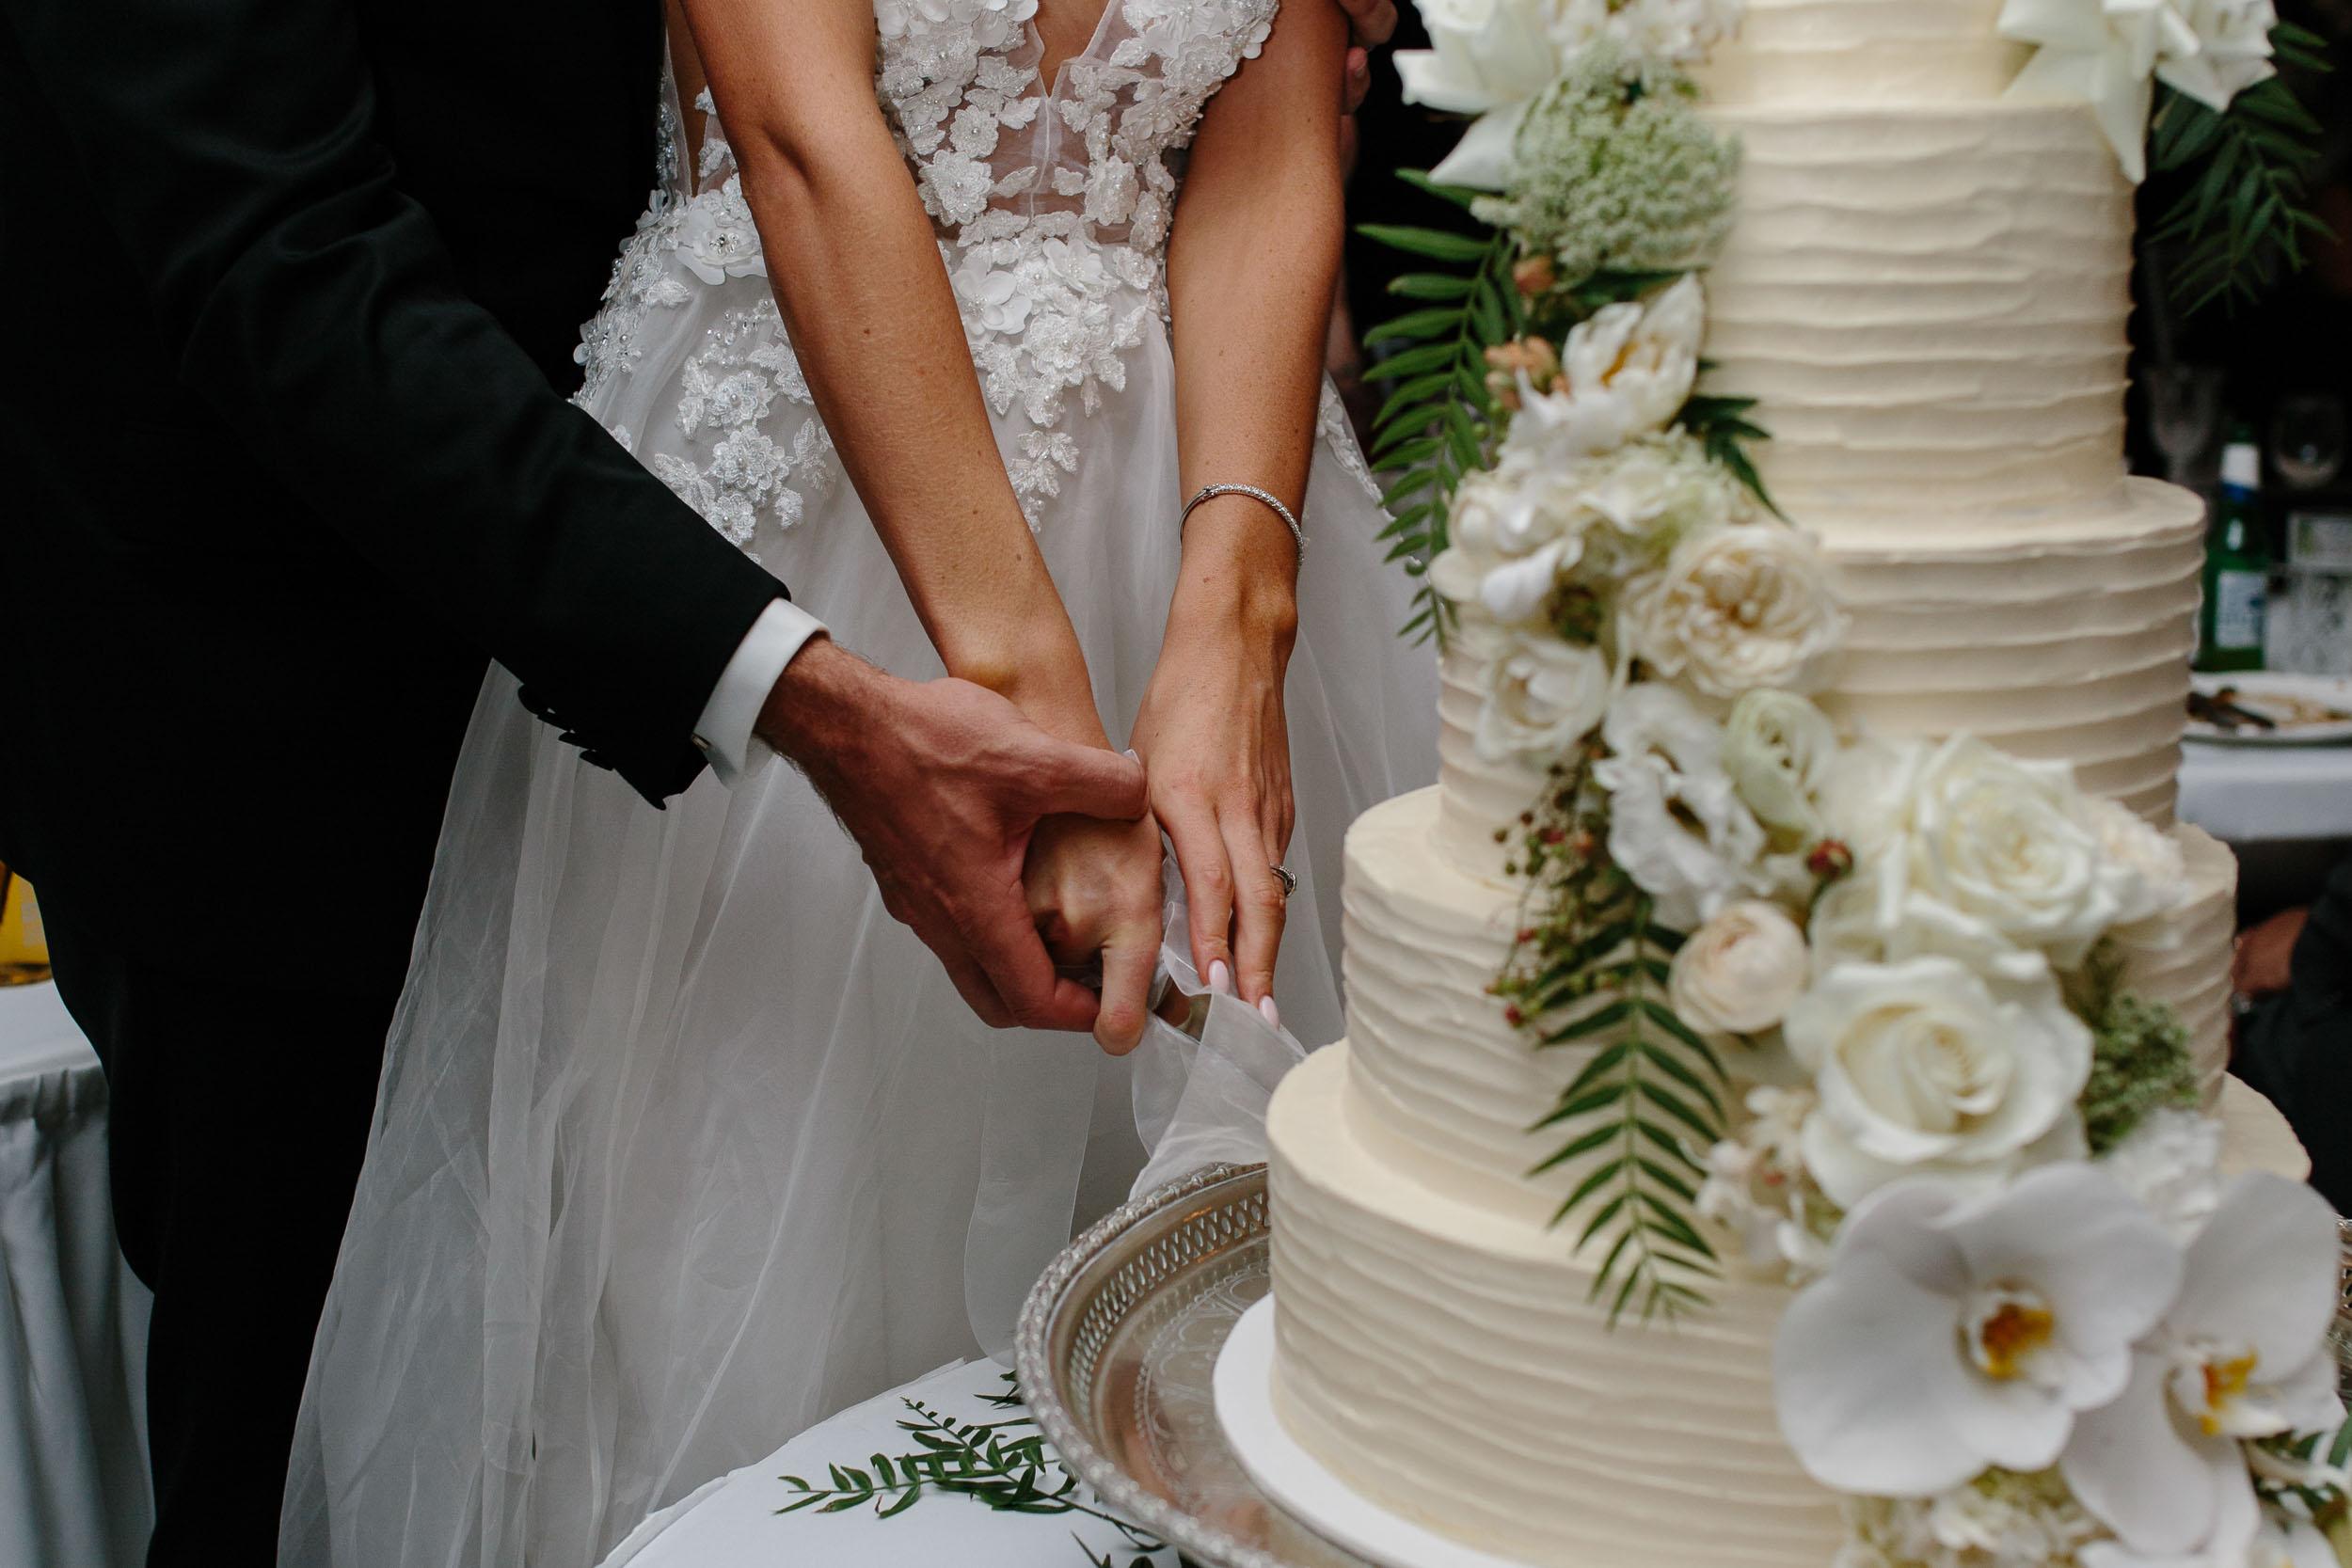 Kas-Richards-Mornington-Peninsula-Private-Property-Wedding-Marianna-Hardwick-Gown-785.jpg